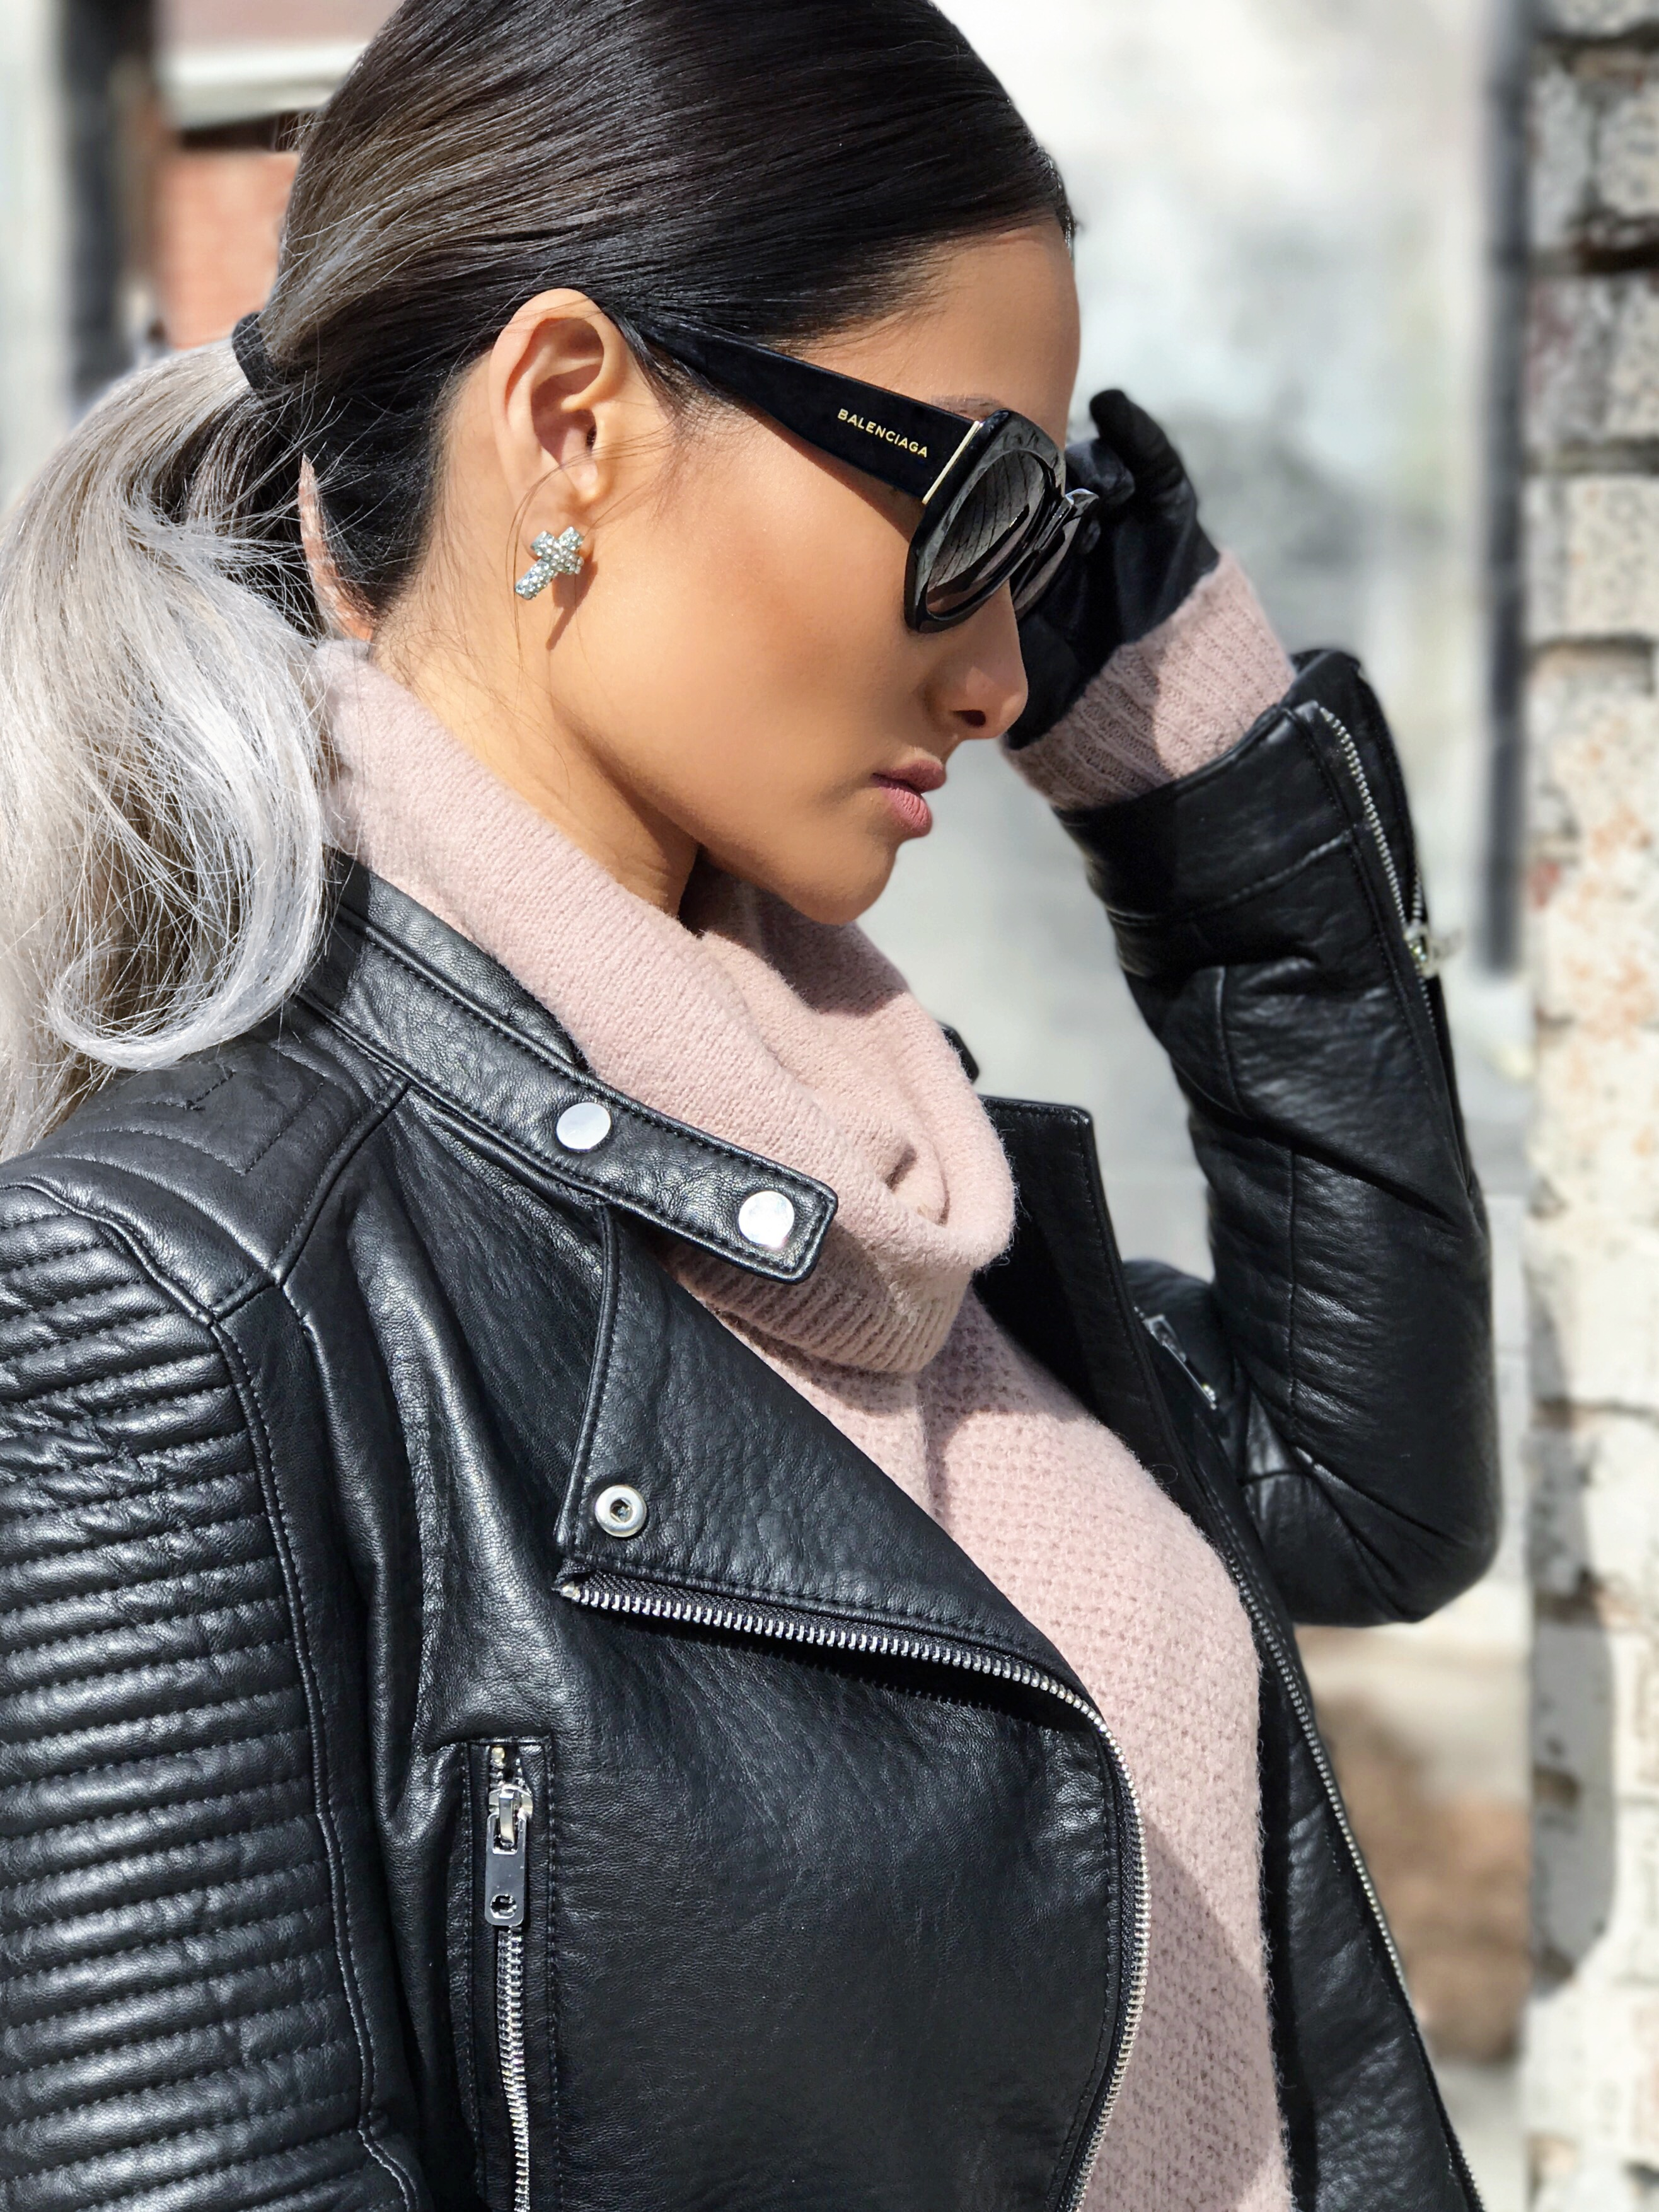 Grey hair don't care, grey hair Asian, grey hair trend,